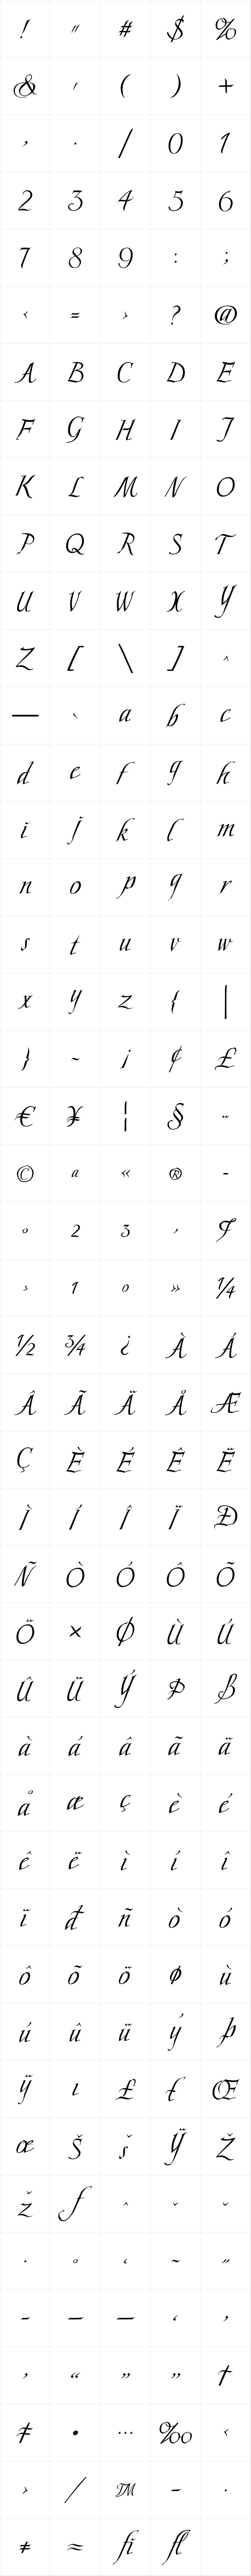 Scriptissimo Middle